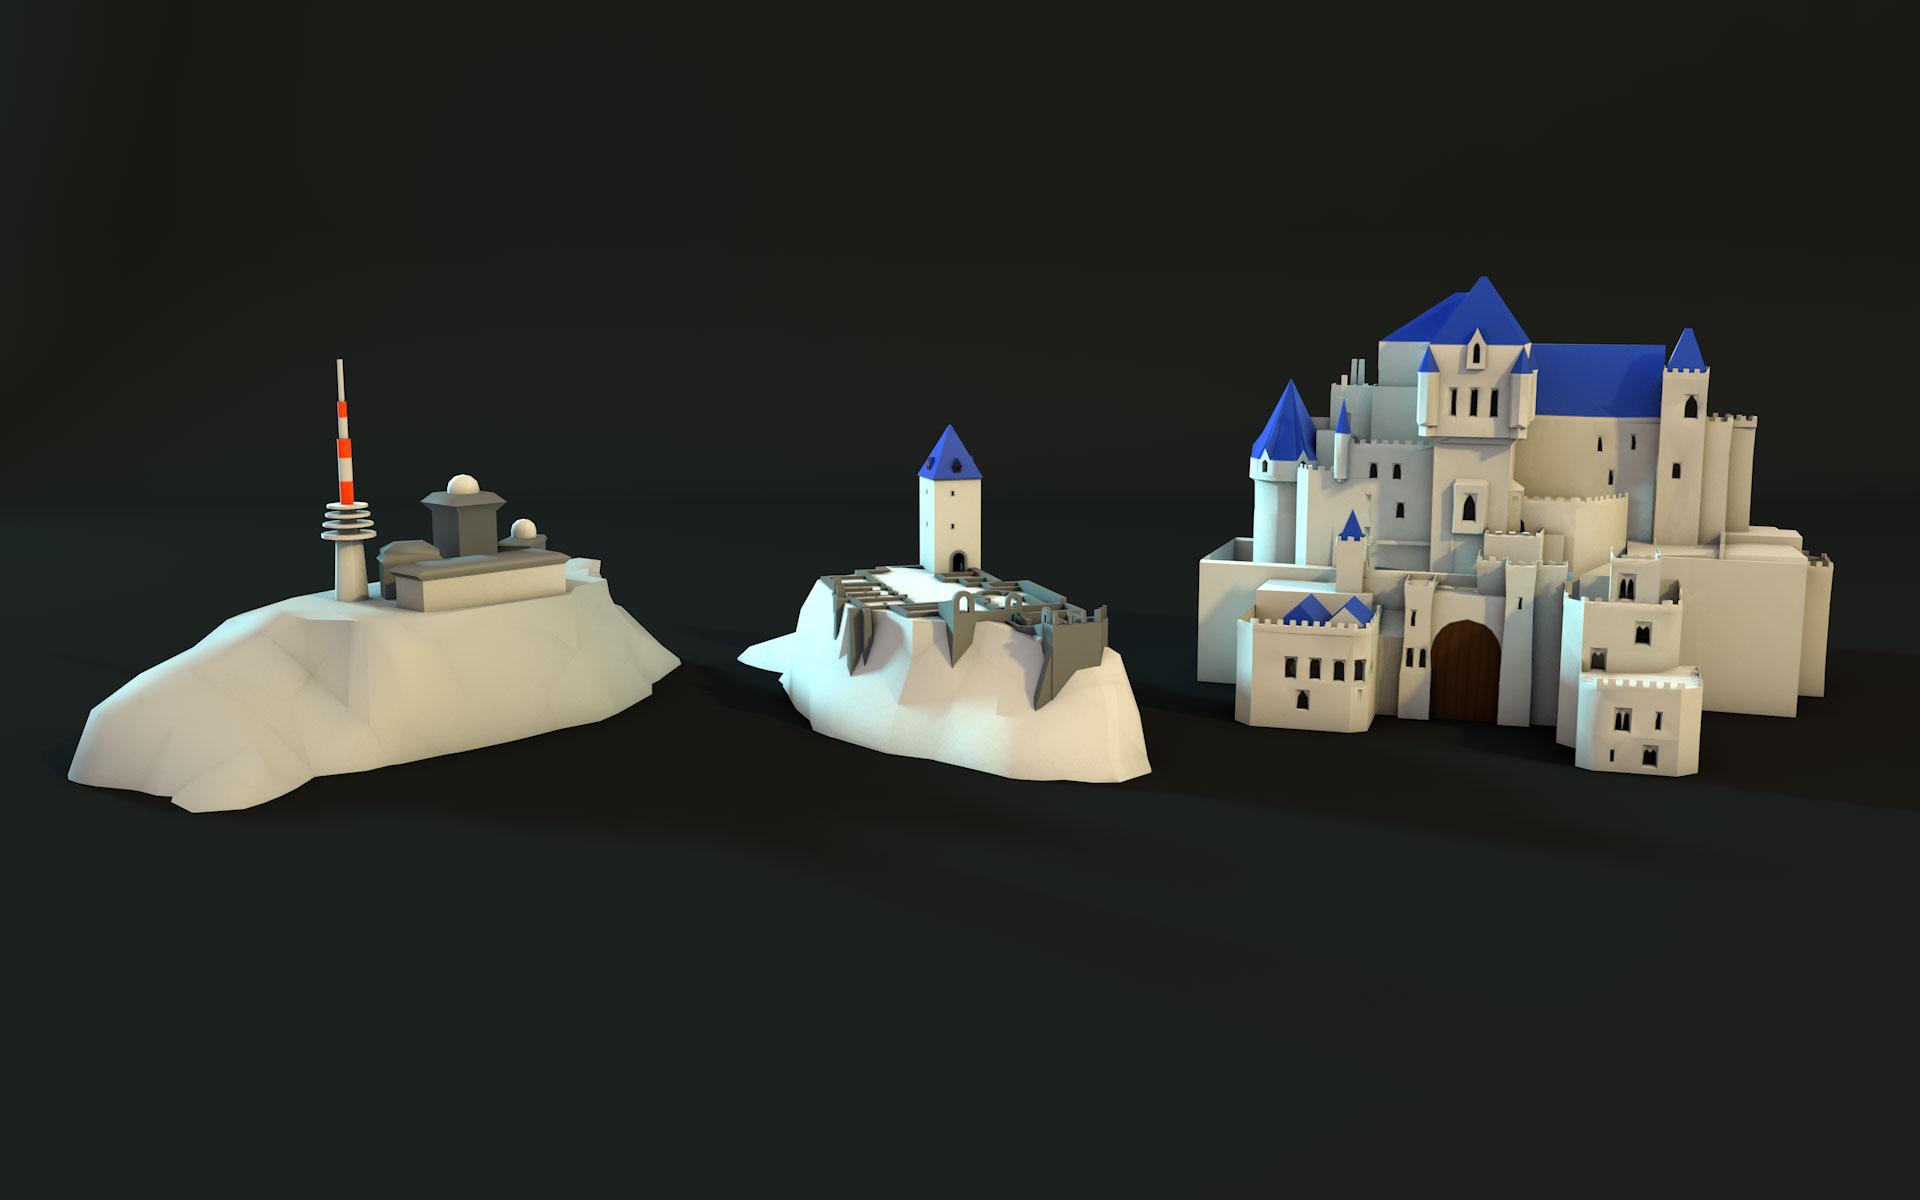 LHK Sachsen-Anhalt, VR Rocking Horse 3D Assets, Burg @ Mathias Nell